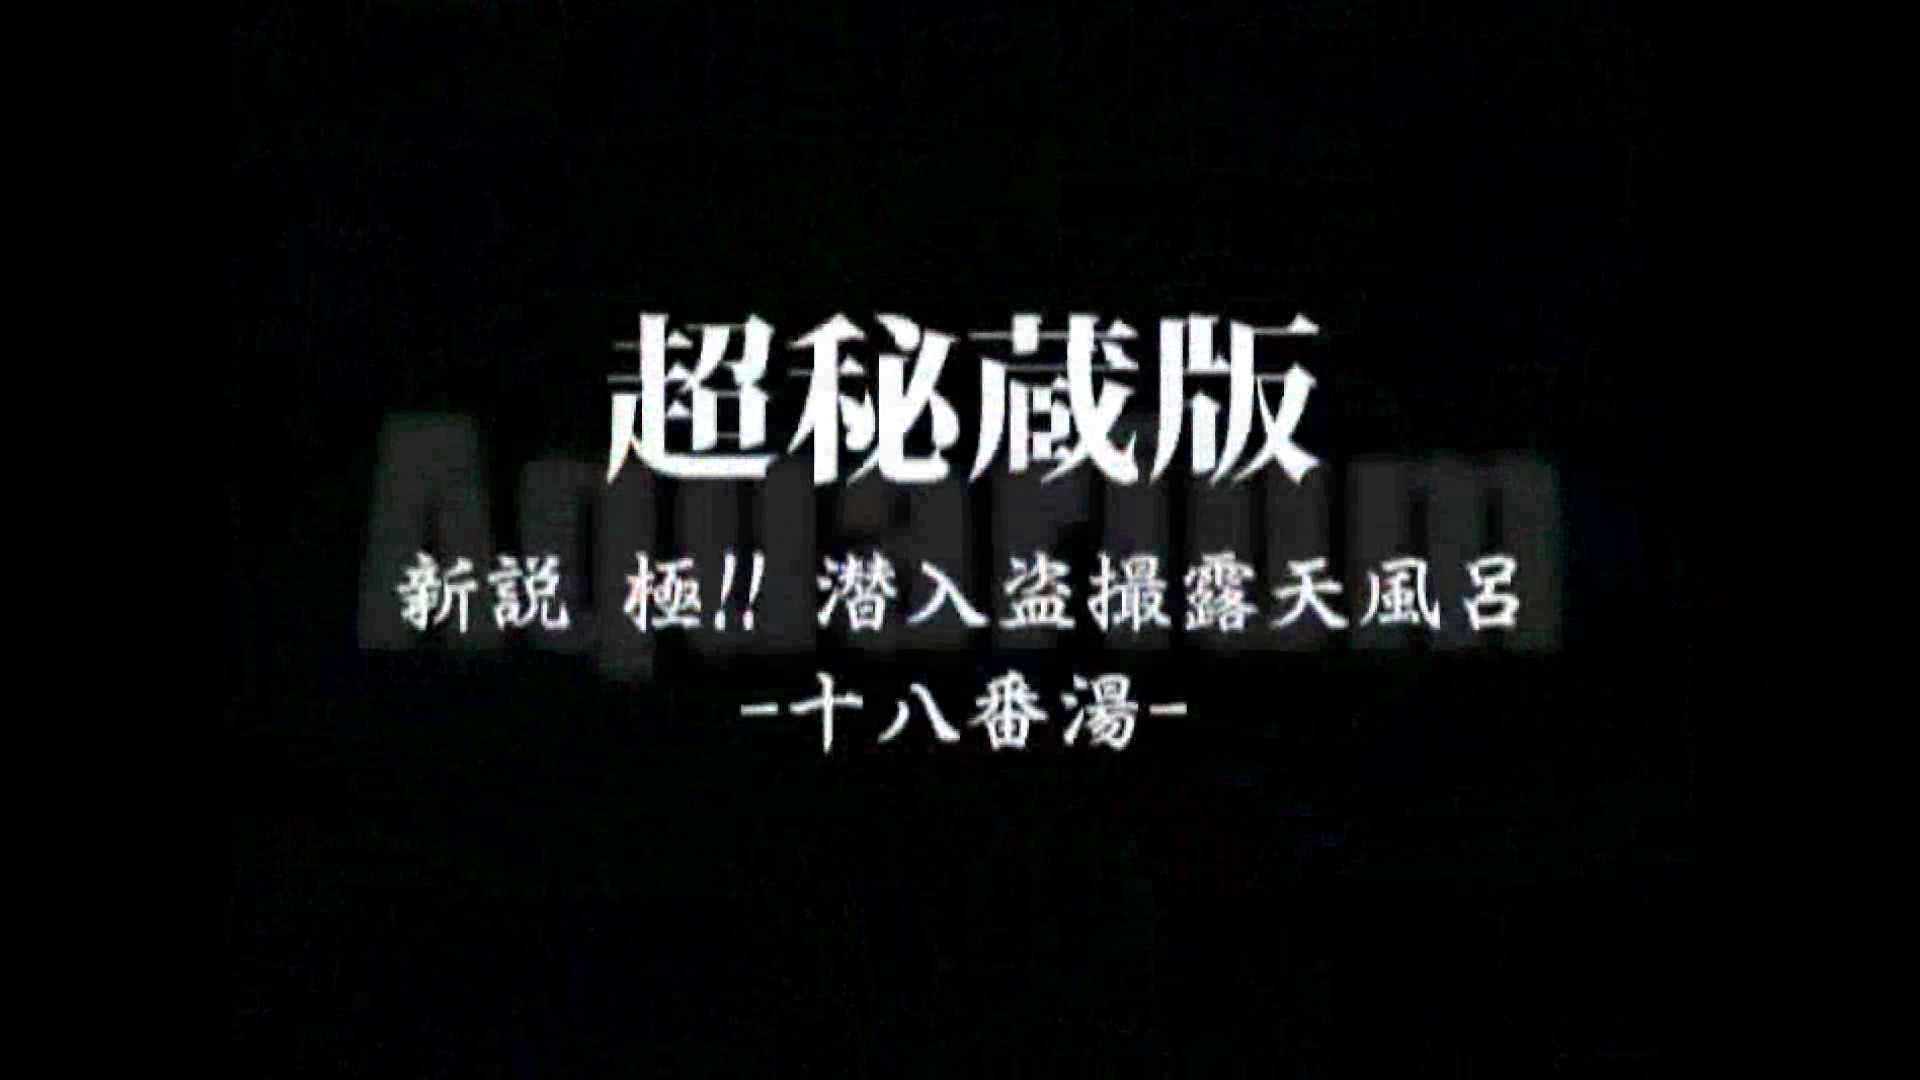 Aquaな露天風呂Vol.882潜入盗撮露天風呂十八判湯 其の四 盗撮シリーズ AV無料動画キャプチャ 109PIX 5